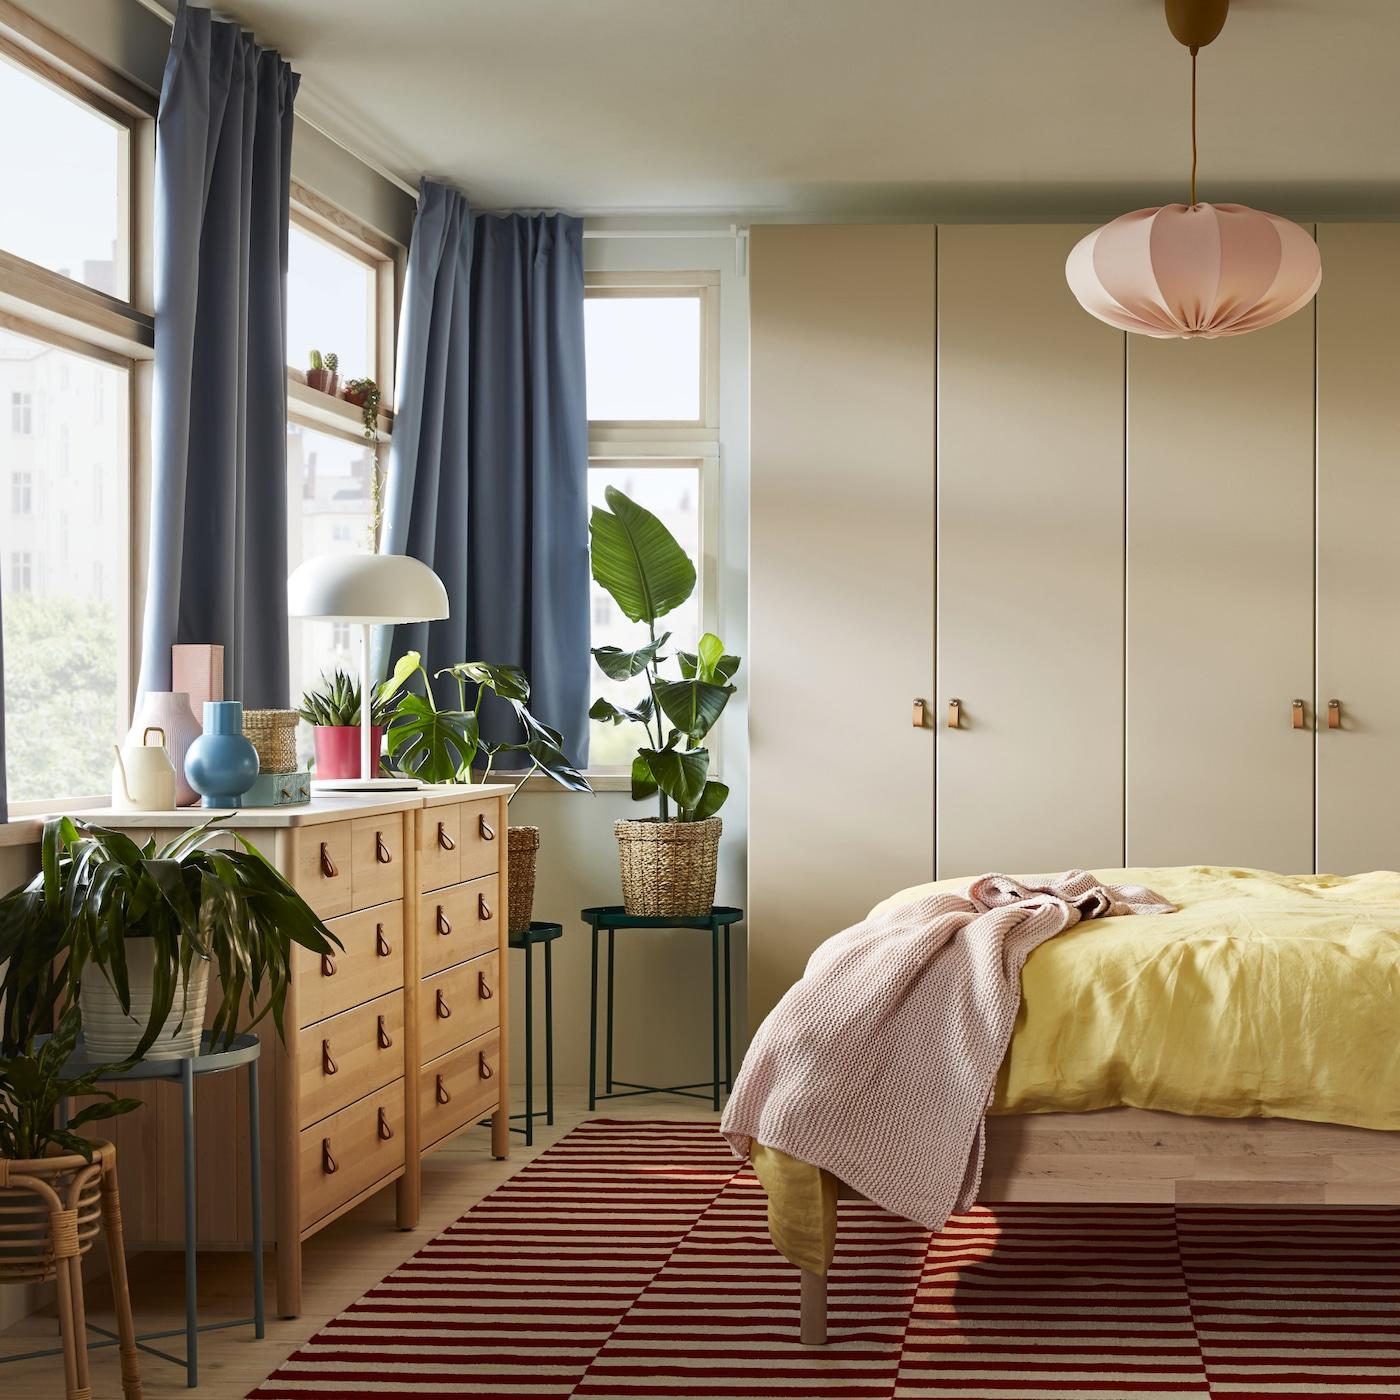 Spavaća soba s krevetnim okvirom i dve komode od breze, sivobež garderoberom, plavim zavesama i žutim krevetnim tekstilima.